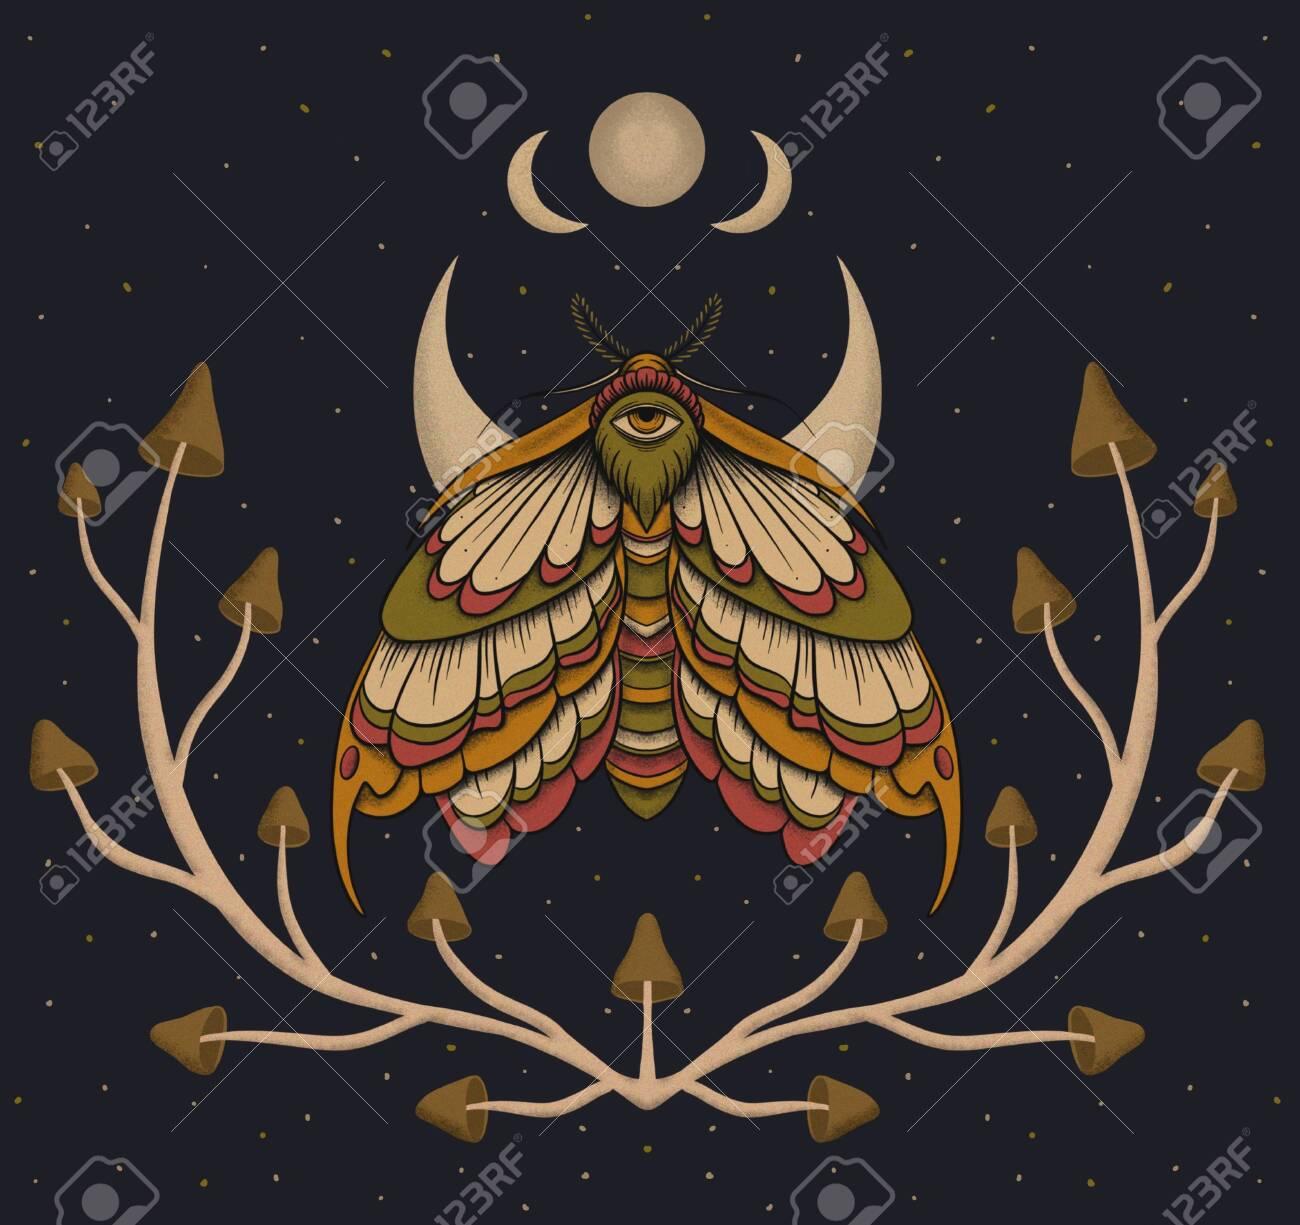 Eyed hawk-moth colored illustration, drawing, engraving, ink, line art - 139090600